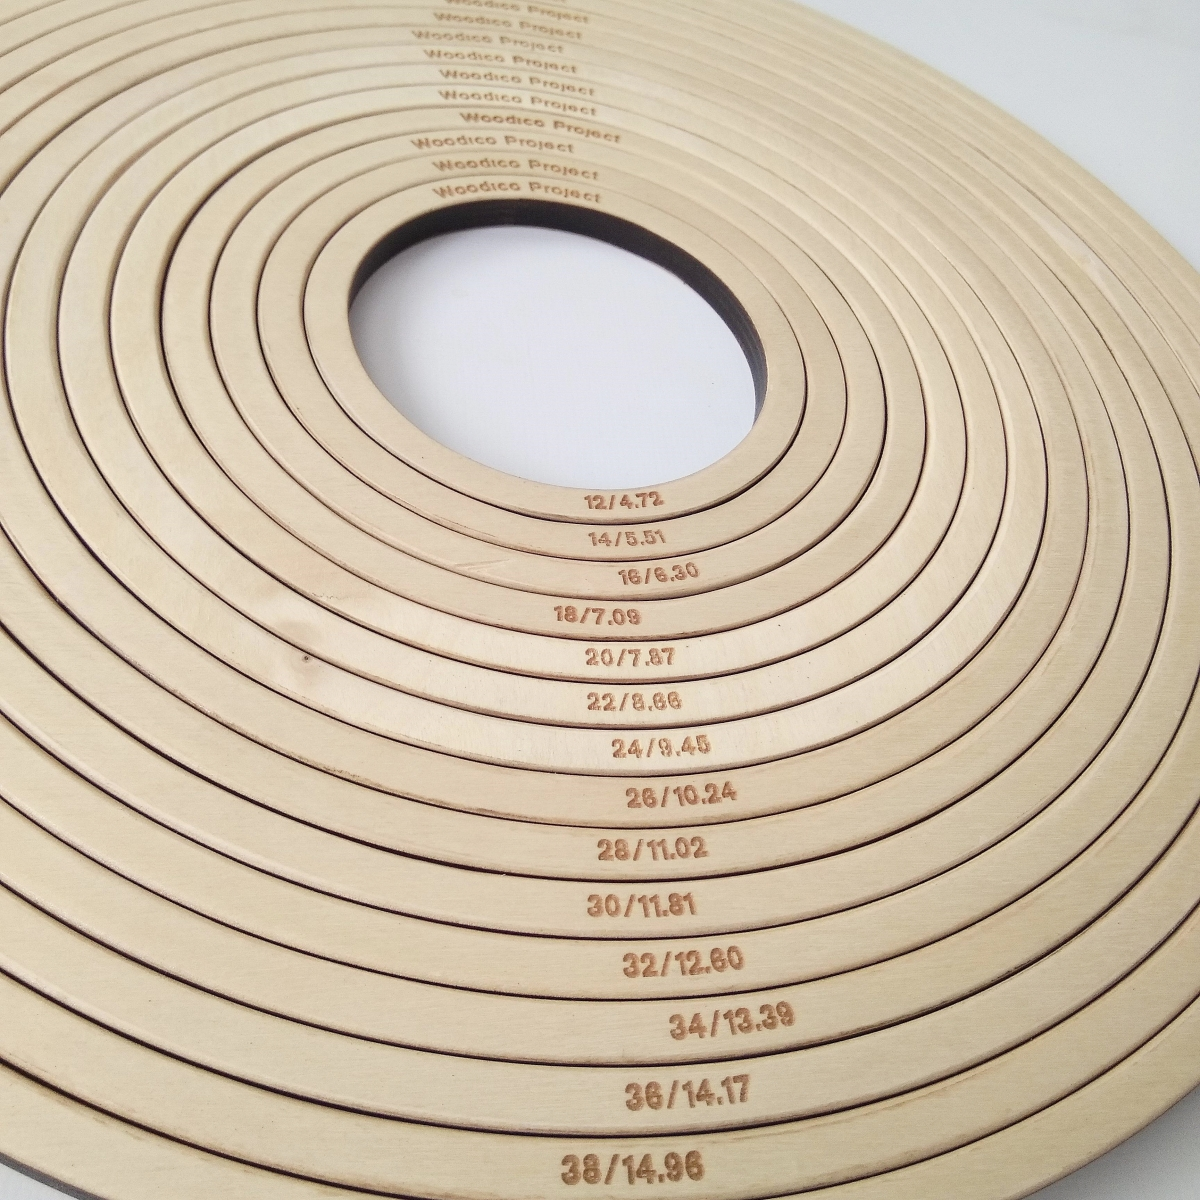 woodico.pro dream catcher base set of 15 rings 12 40 cm 12 1200x1200 - Dream catcher base / Set of 15 rings 12-40 cm